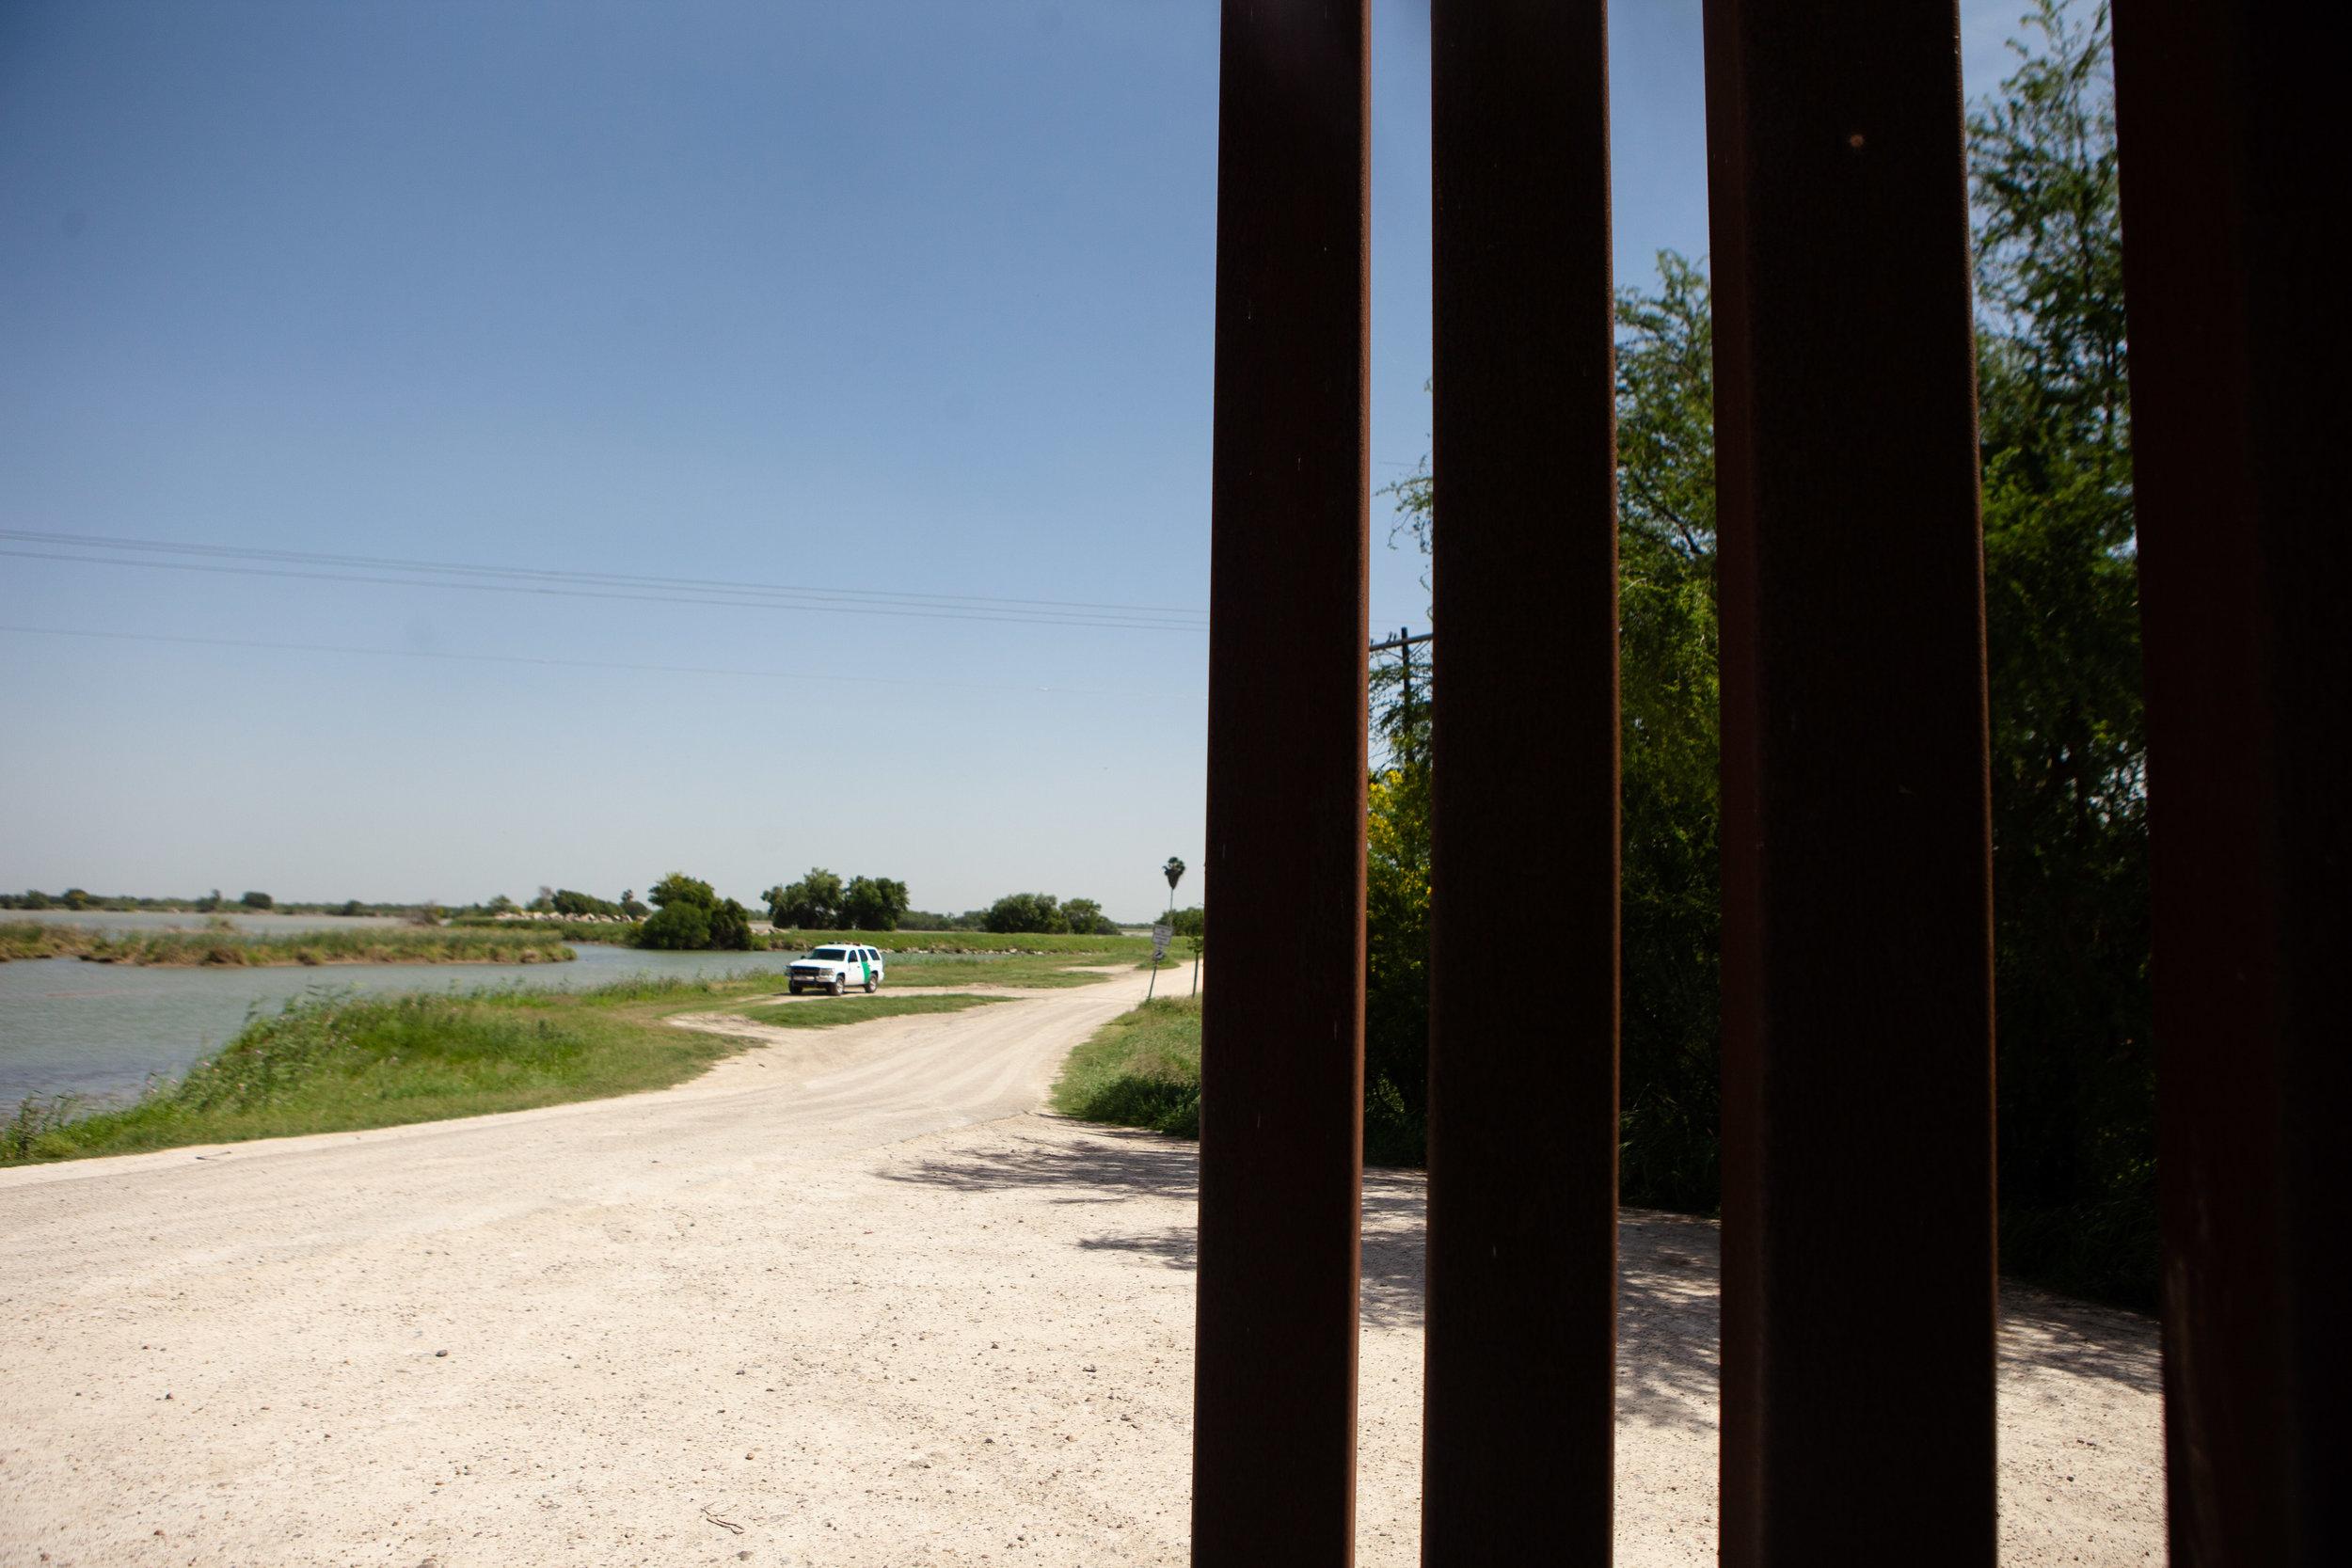 Border_Perspective-4.JPG